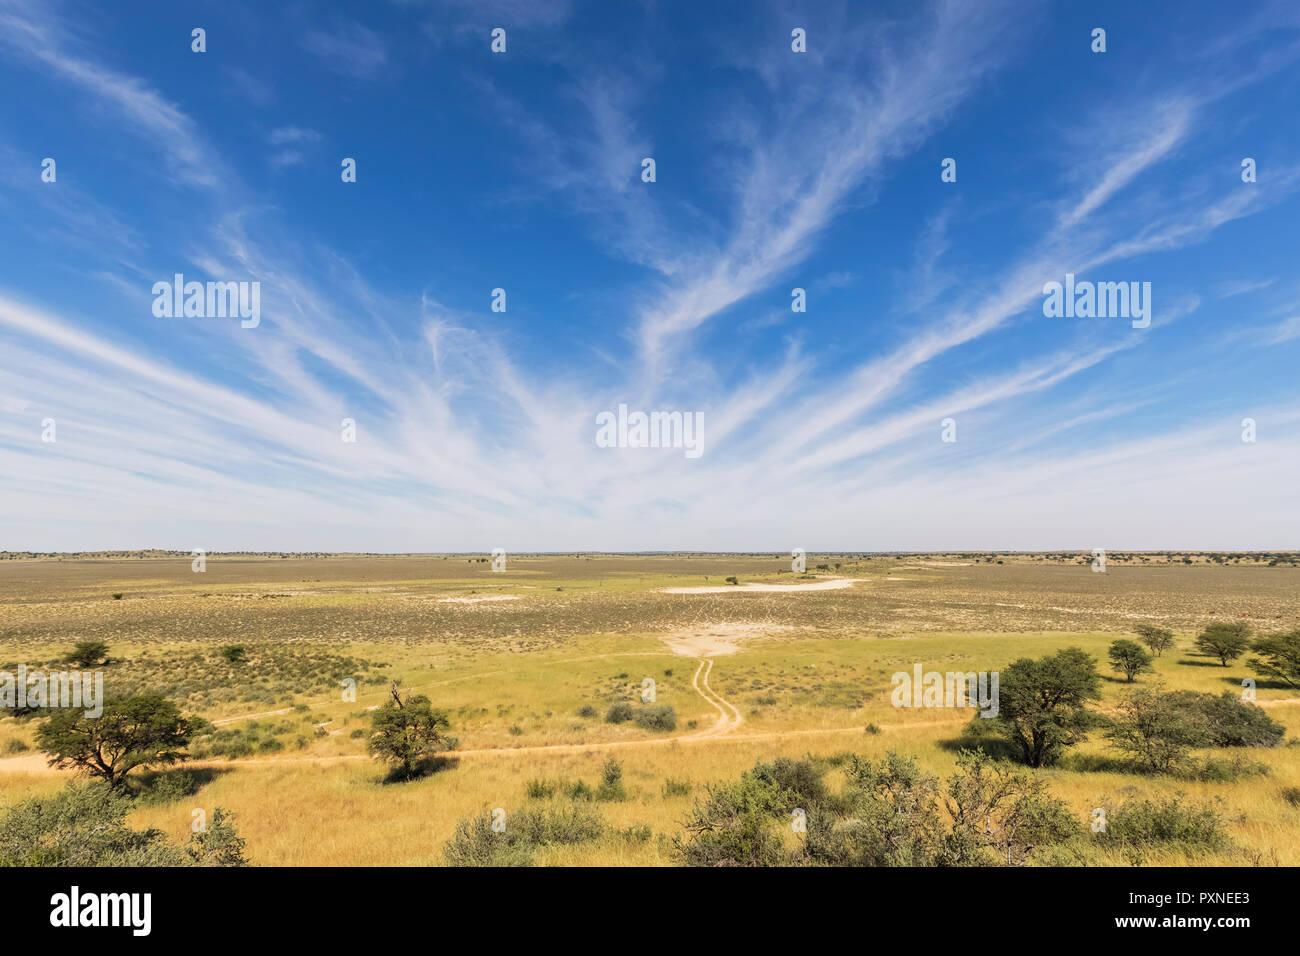 Africa, Botswana, Kgalagadi Transfrontier Park, Kalahari, Polentswa Pan and waterhole - Stock Image